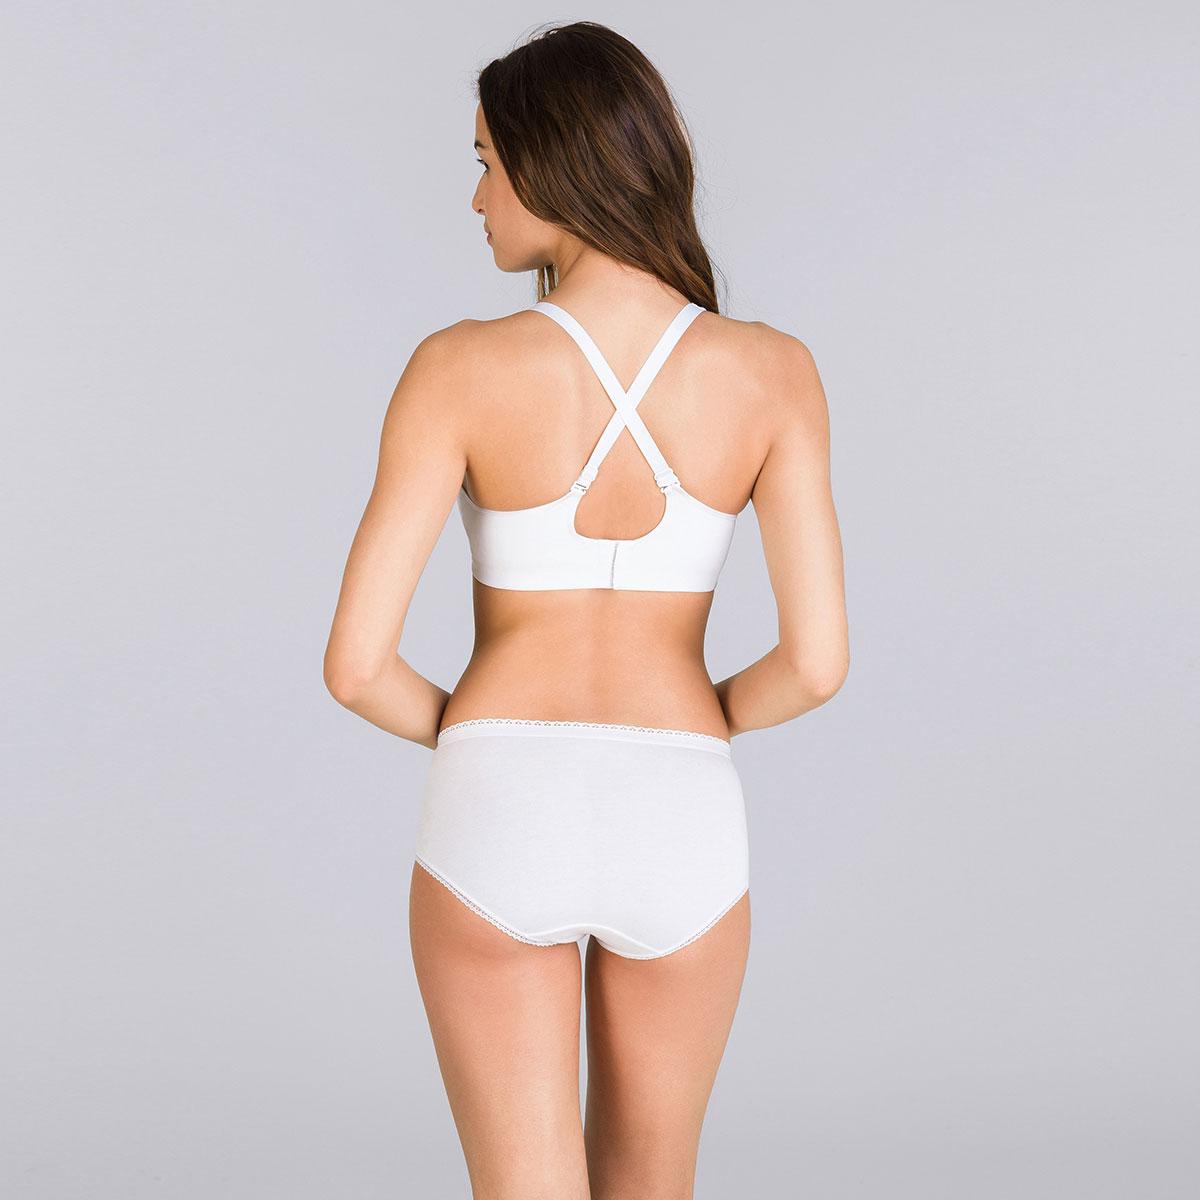 Soutien-gorge sans armatures blanc - Feel Good Support-PLAYTEX